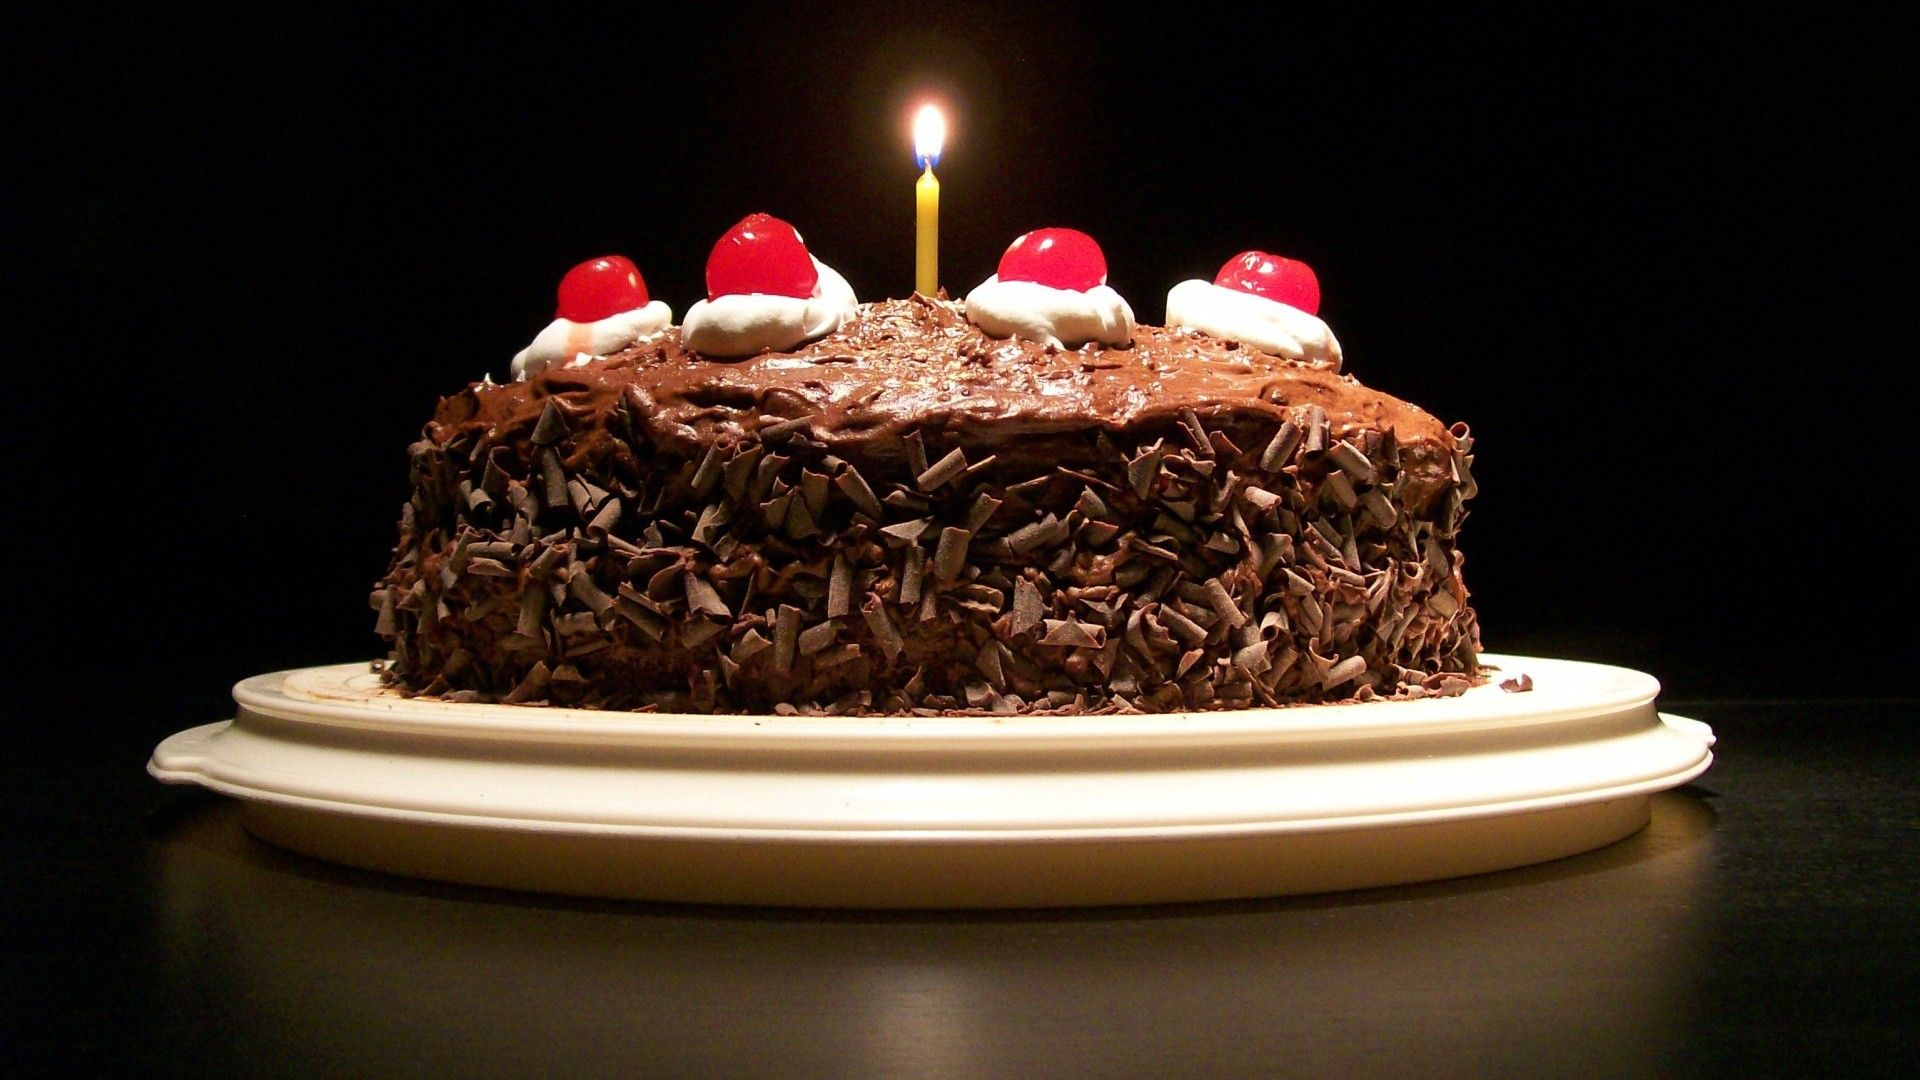 Birthday Cake Cool Wallpaper